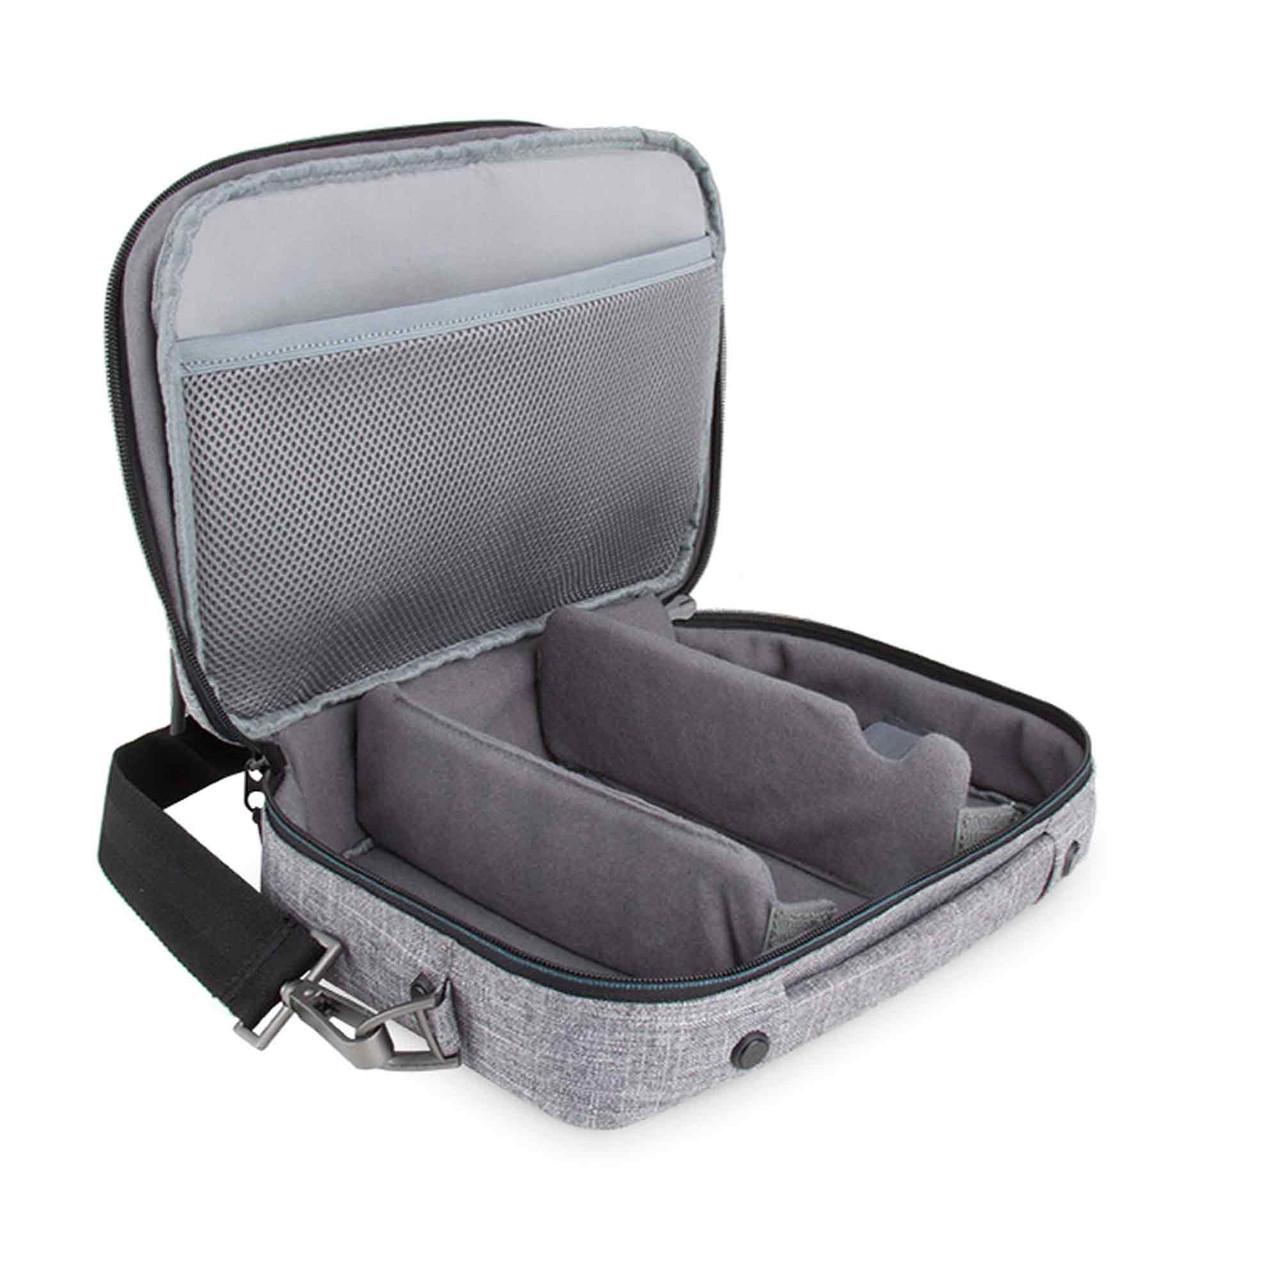 Resmed AirMini Travel Bag travel CPAP